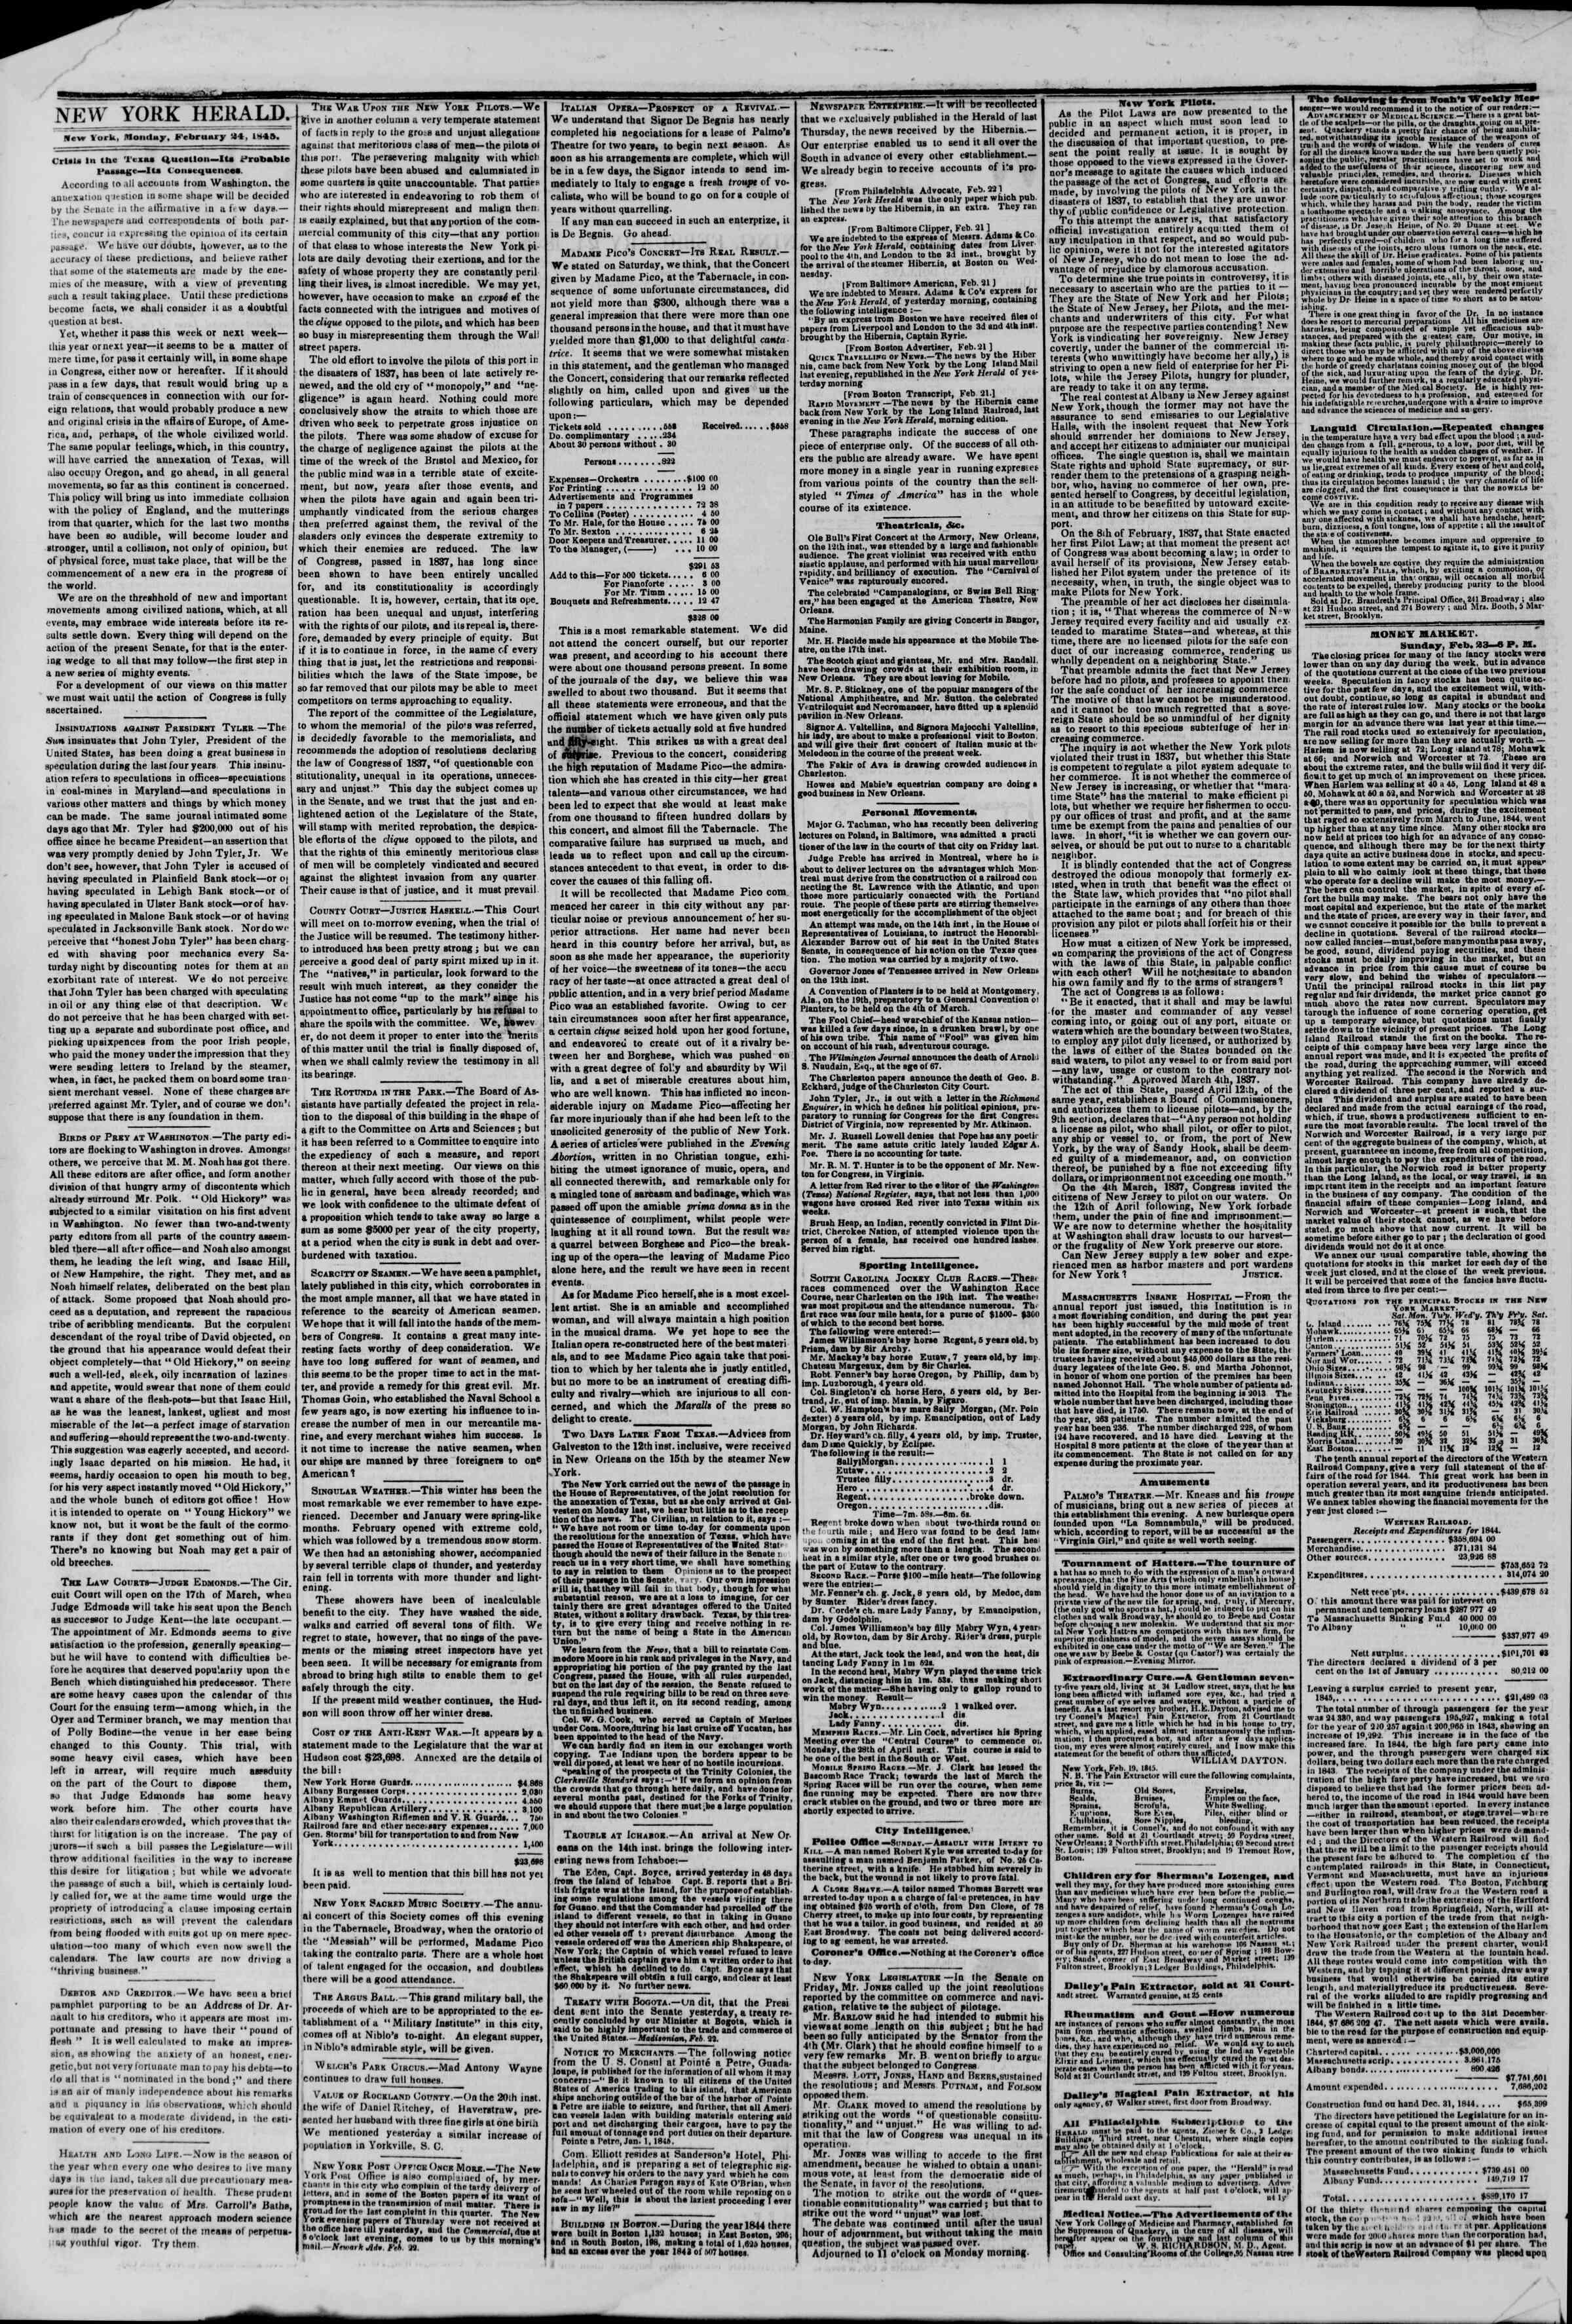 February 24, 1845 Tarihli The New York Herald Gazetesi Sayfa 2